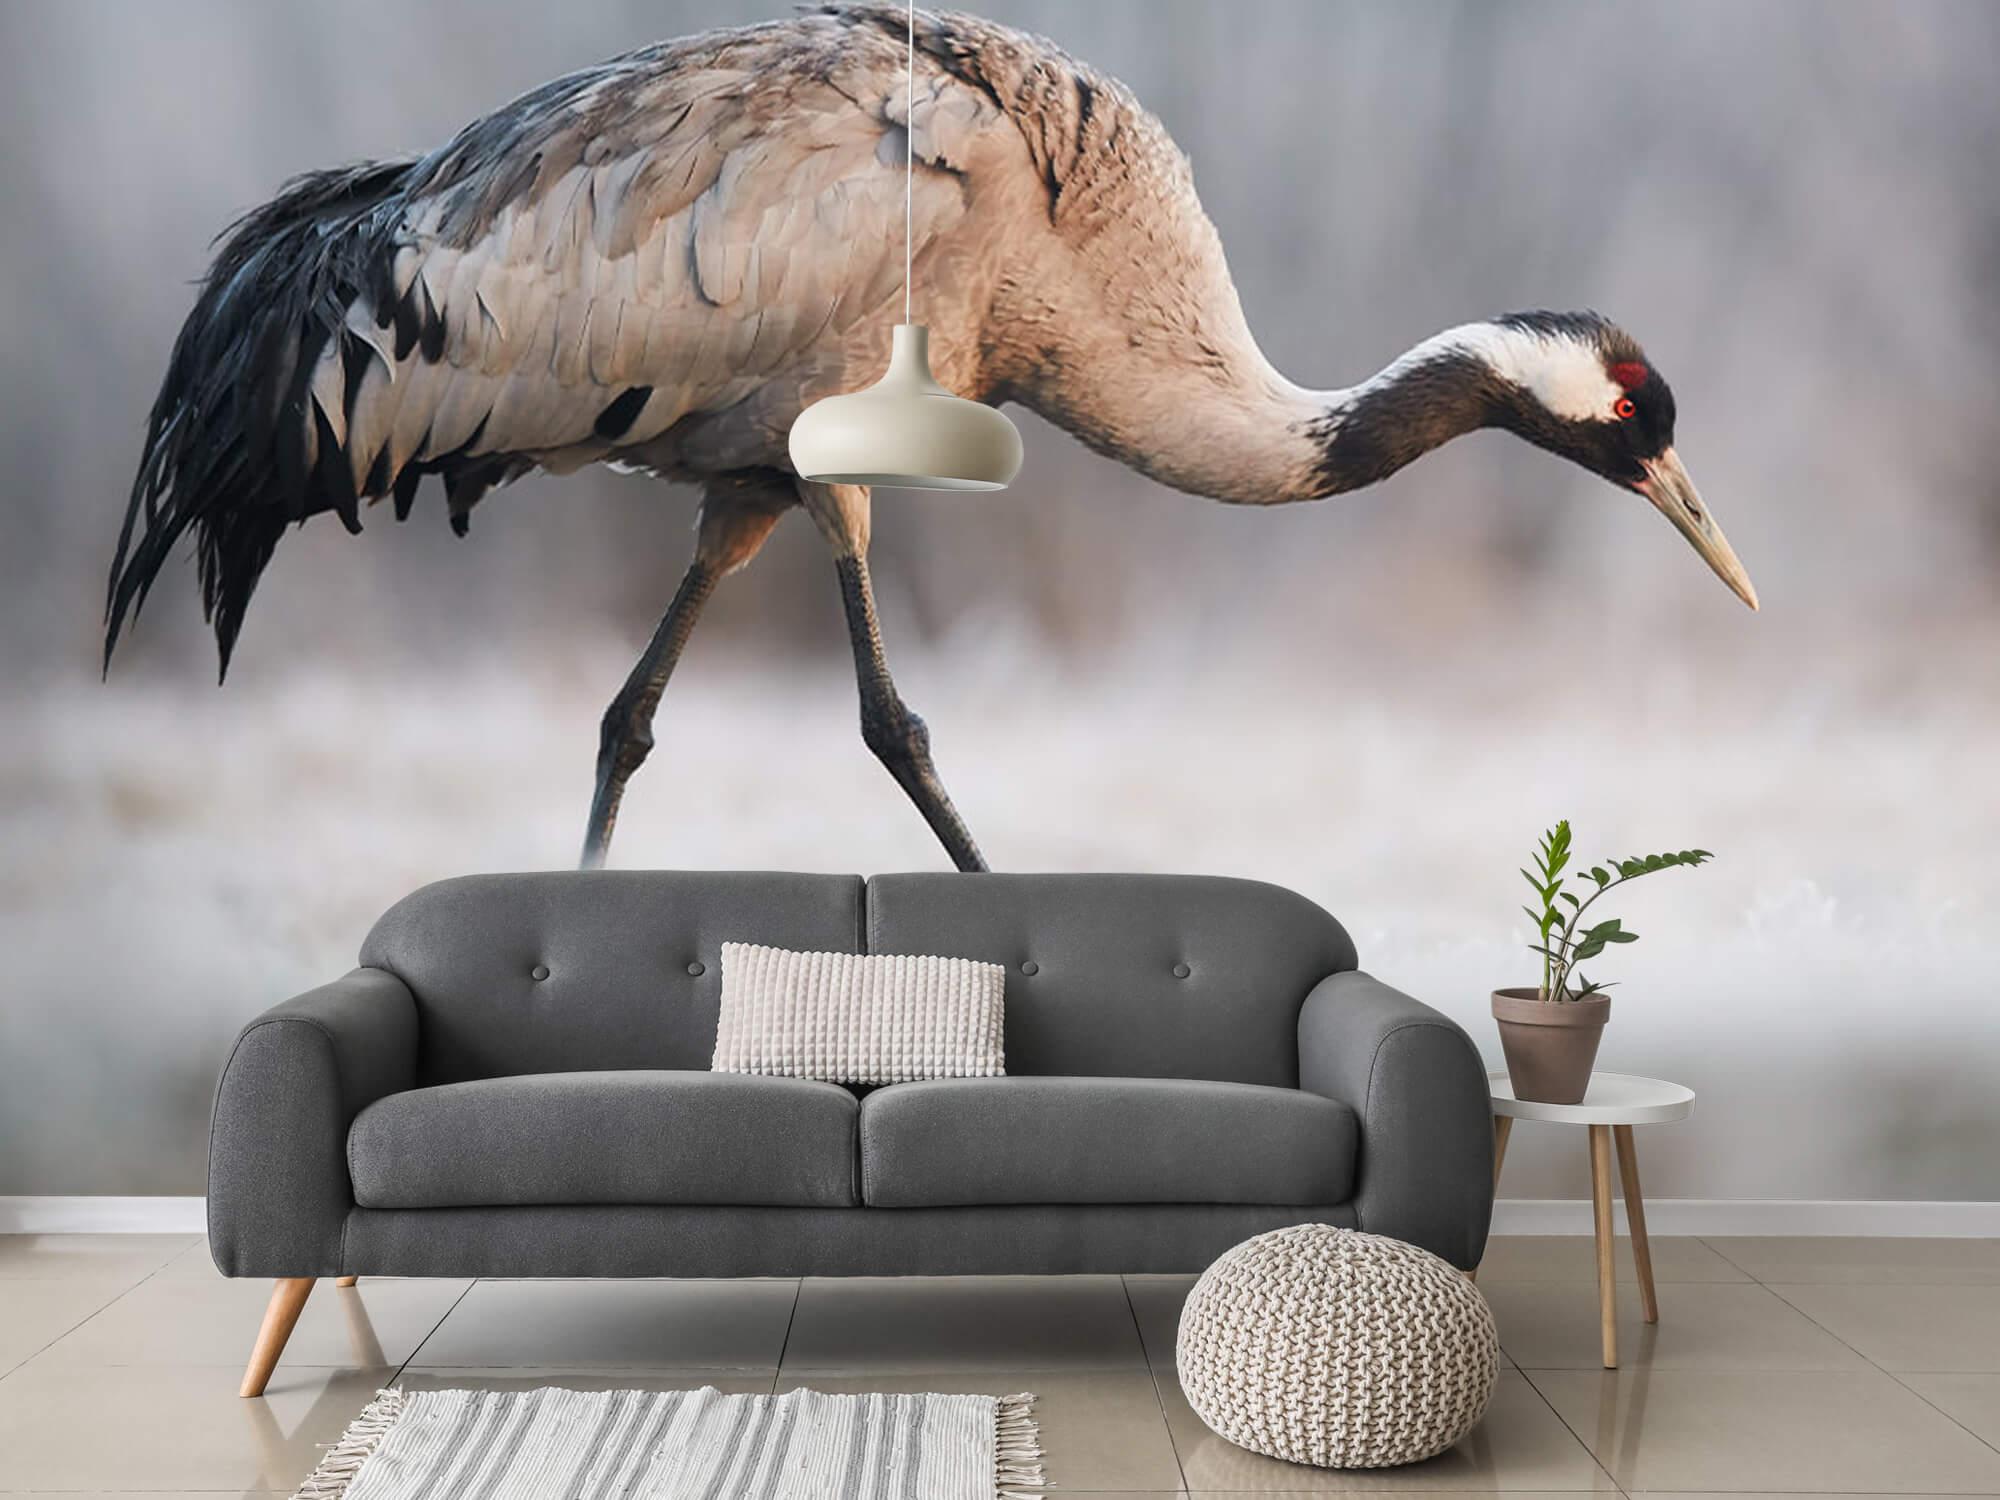 Kraanvogel in de ochtend 11